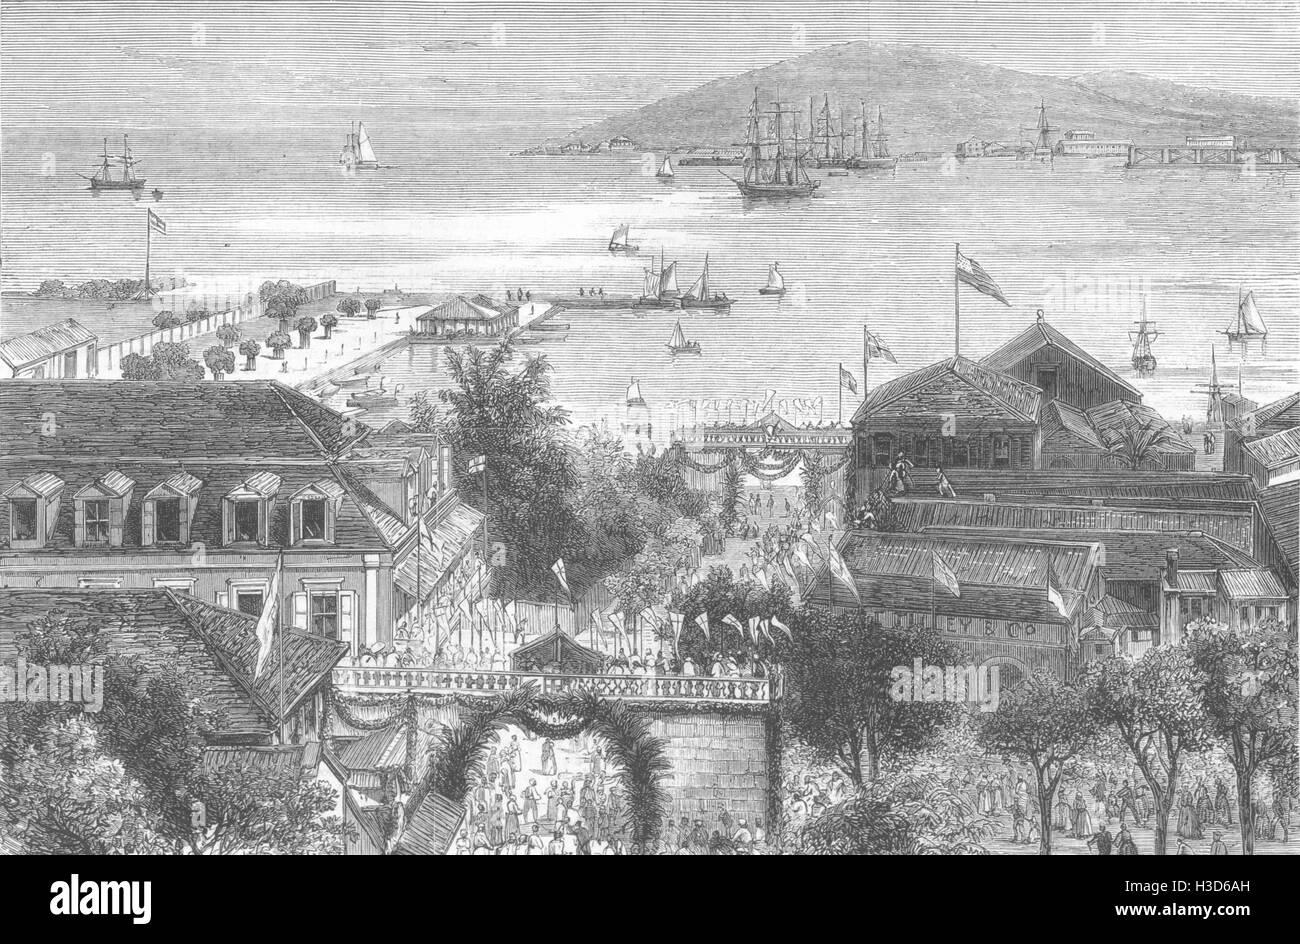 US VIRGIN ISLANDS Prince Waldemar's arival Charlotte Amalia, St Thomas 1879. The Graphic - Stock Image